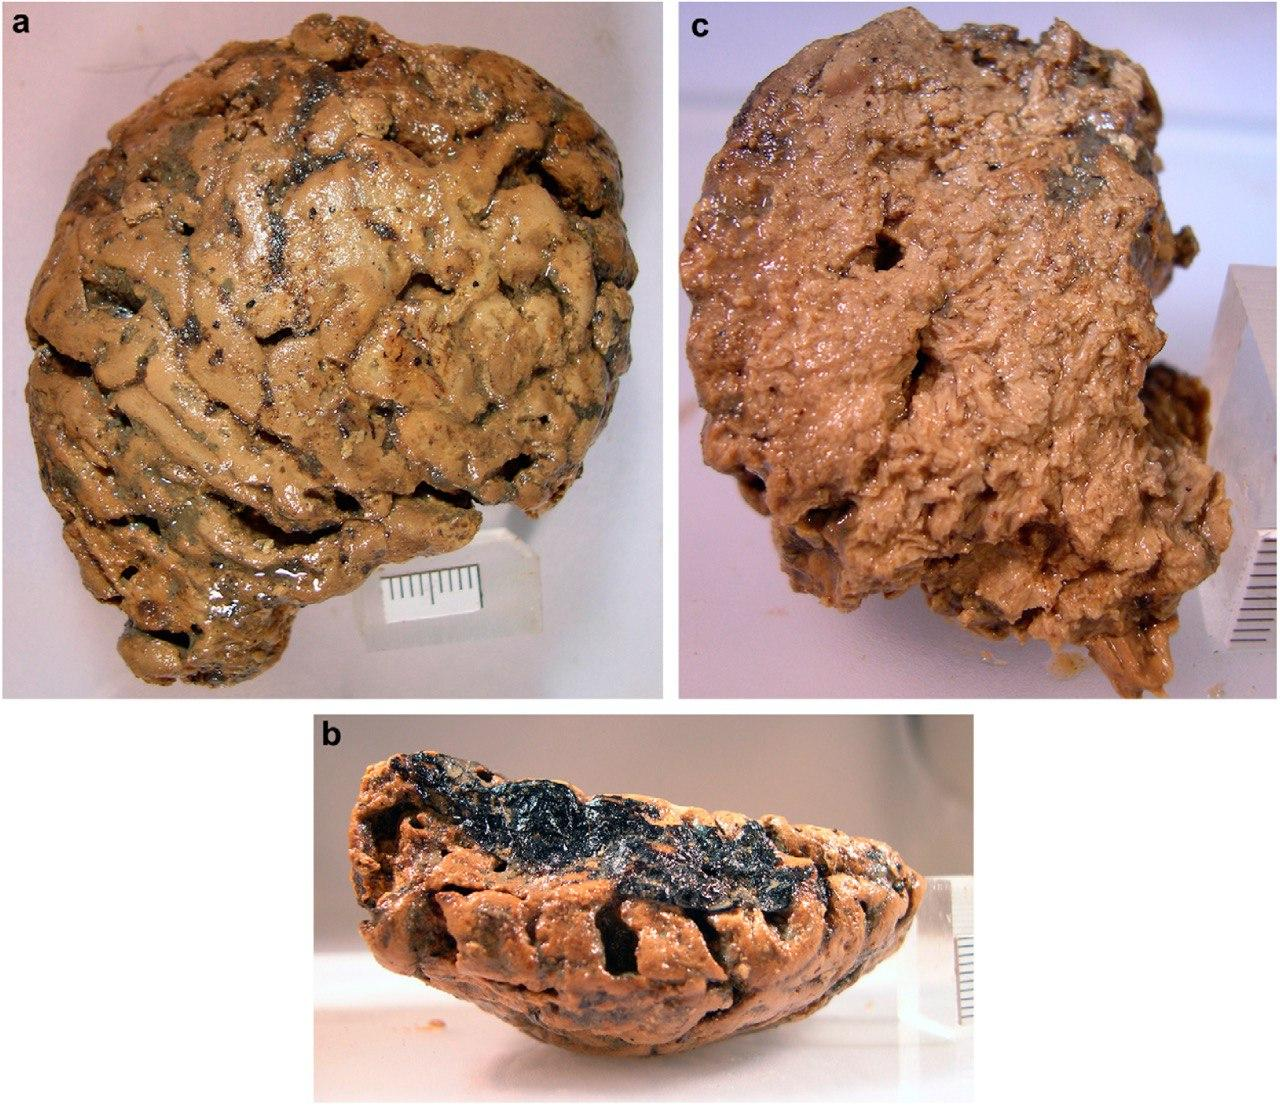 Неизвестное вещество: мозг британца не сгнил за 2000 лет